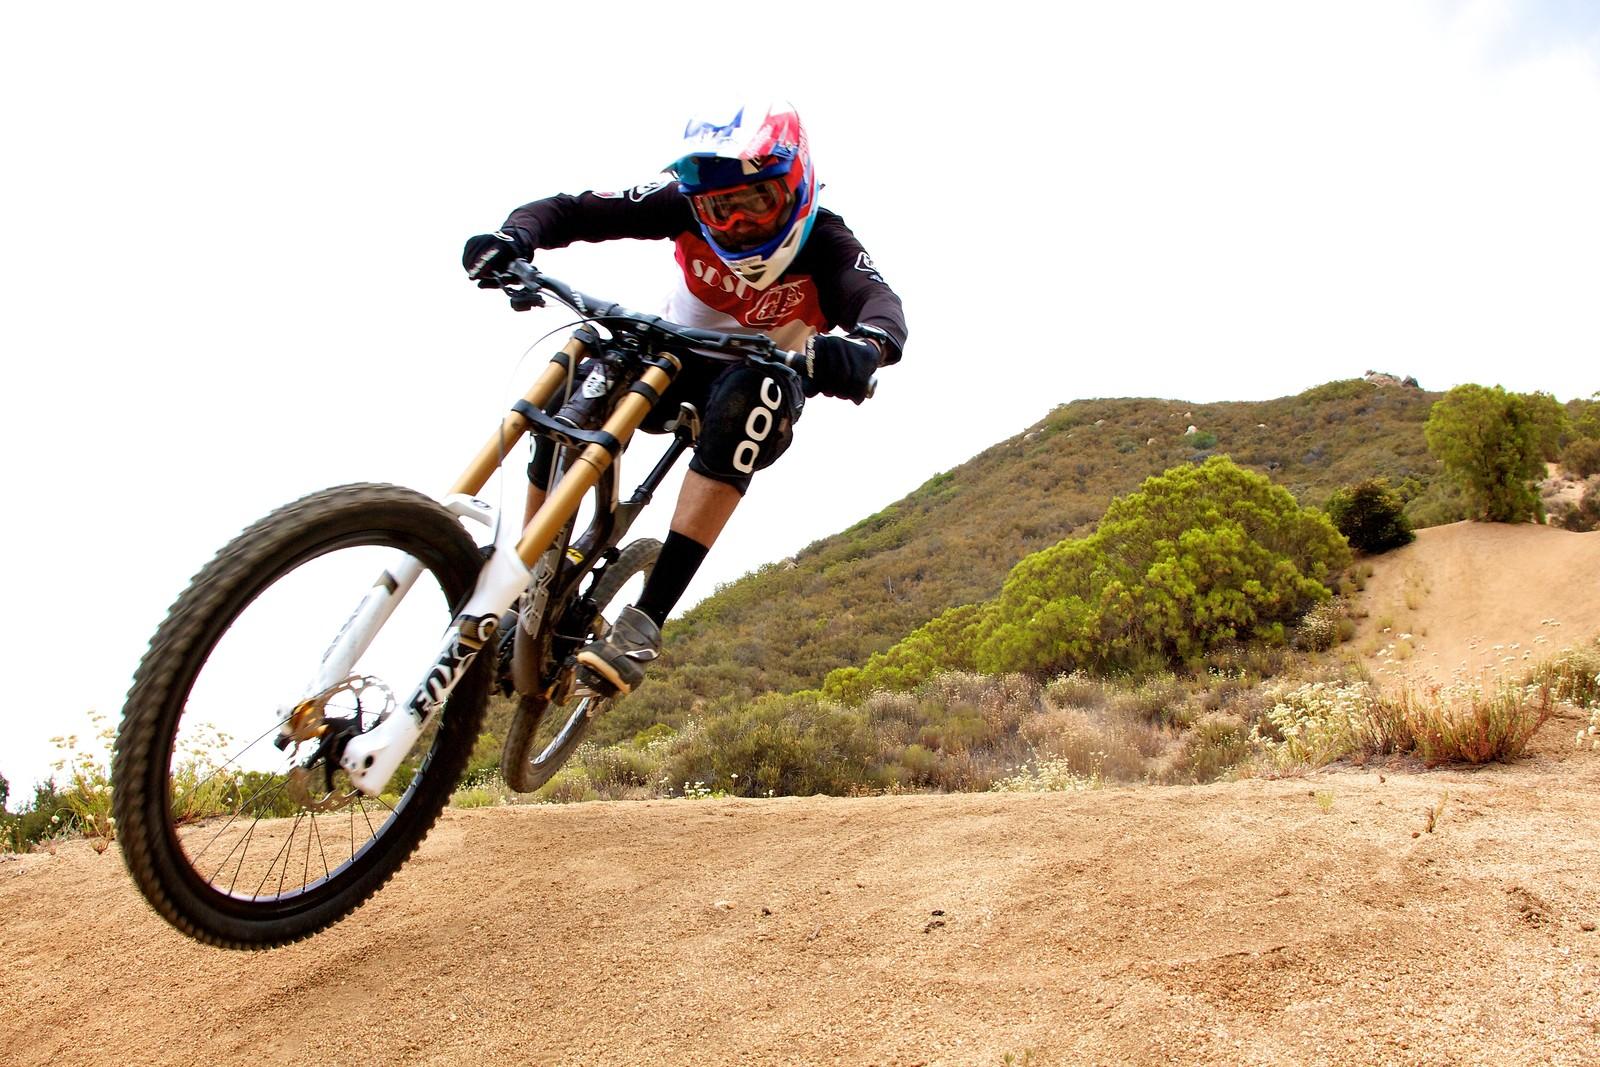 Pine Life - ALF - Mountain Biking Pictures - Vital MTB